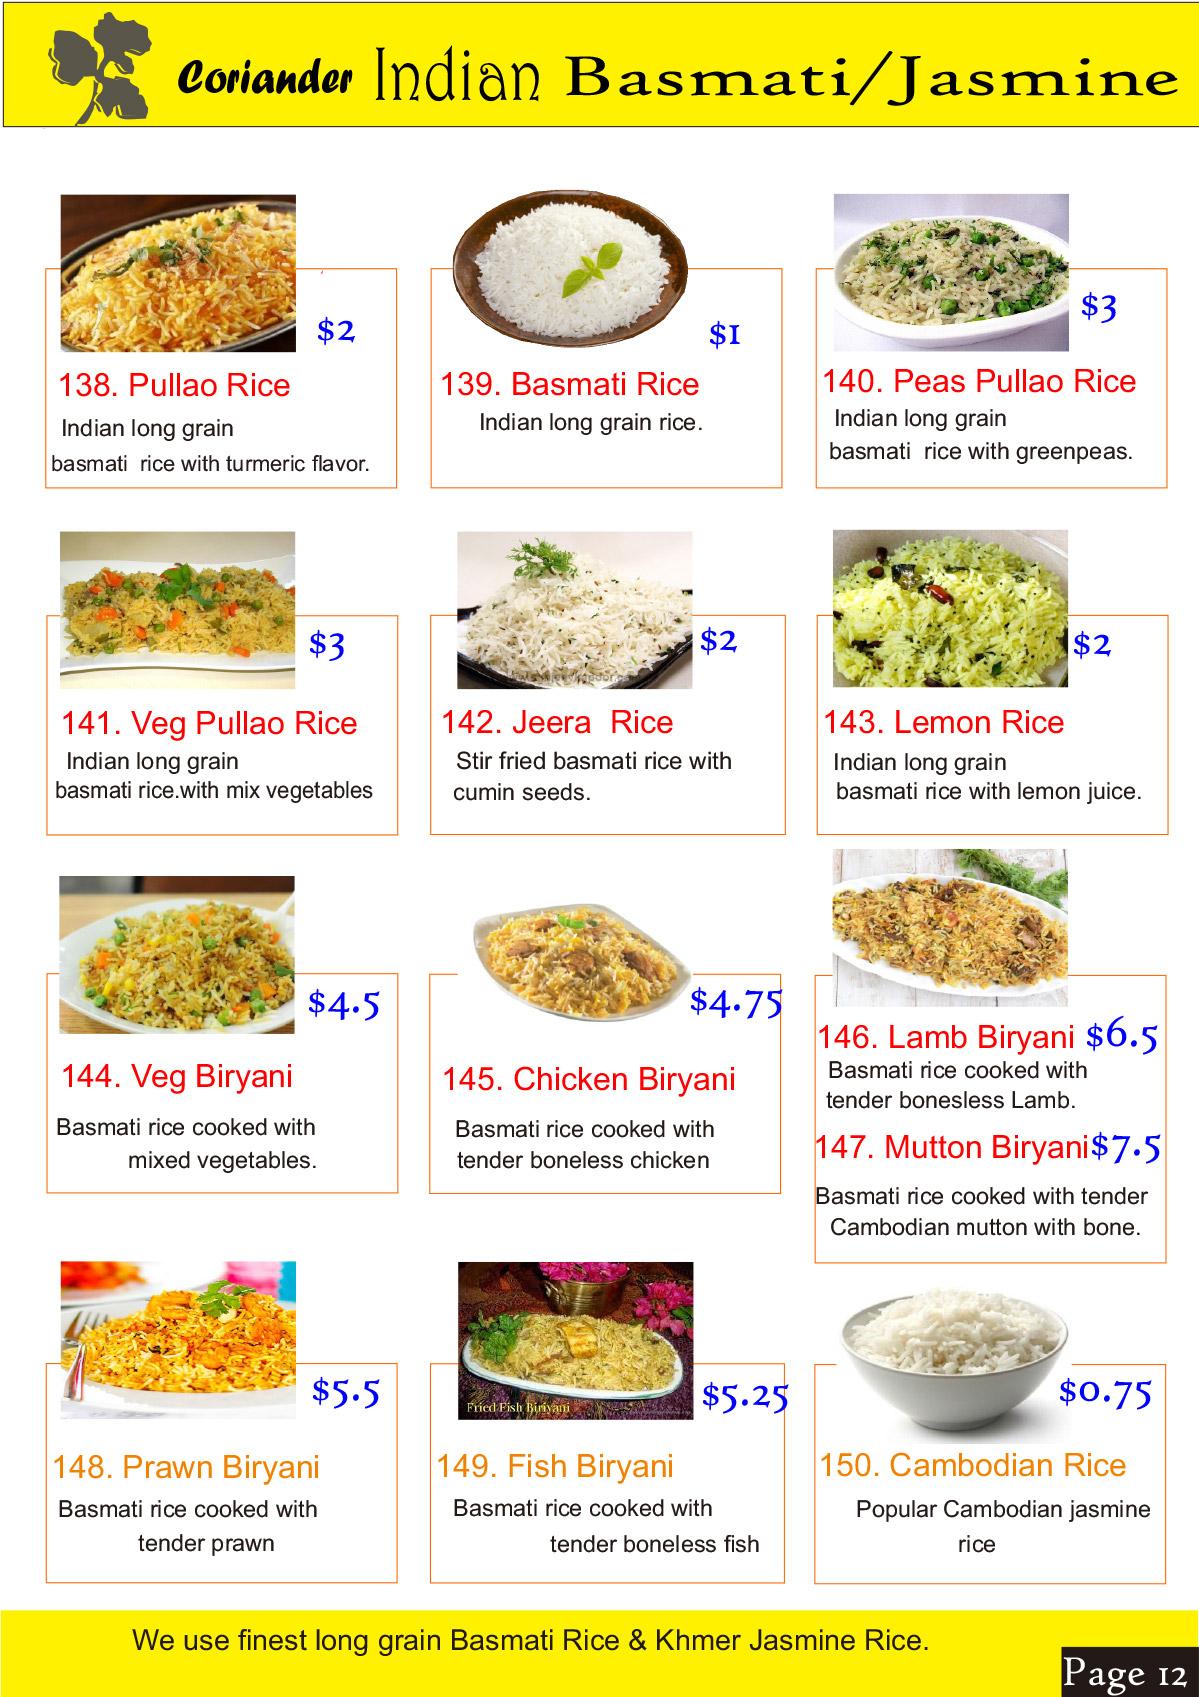 Coriander-new-menu-5-Jan-2020-12